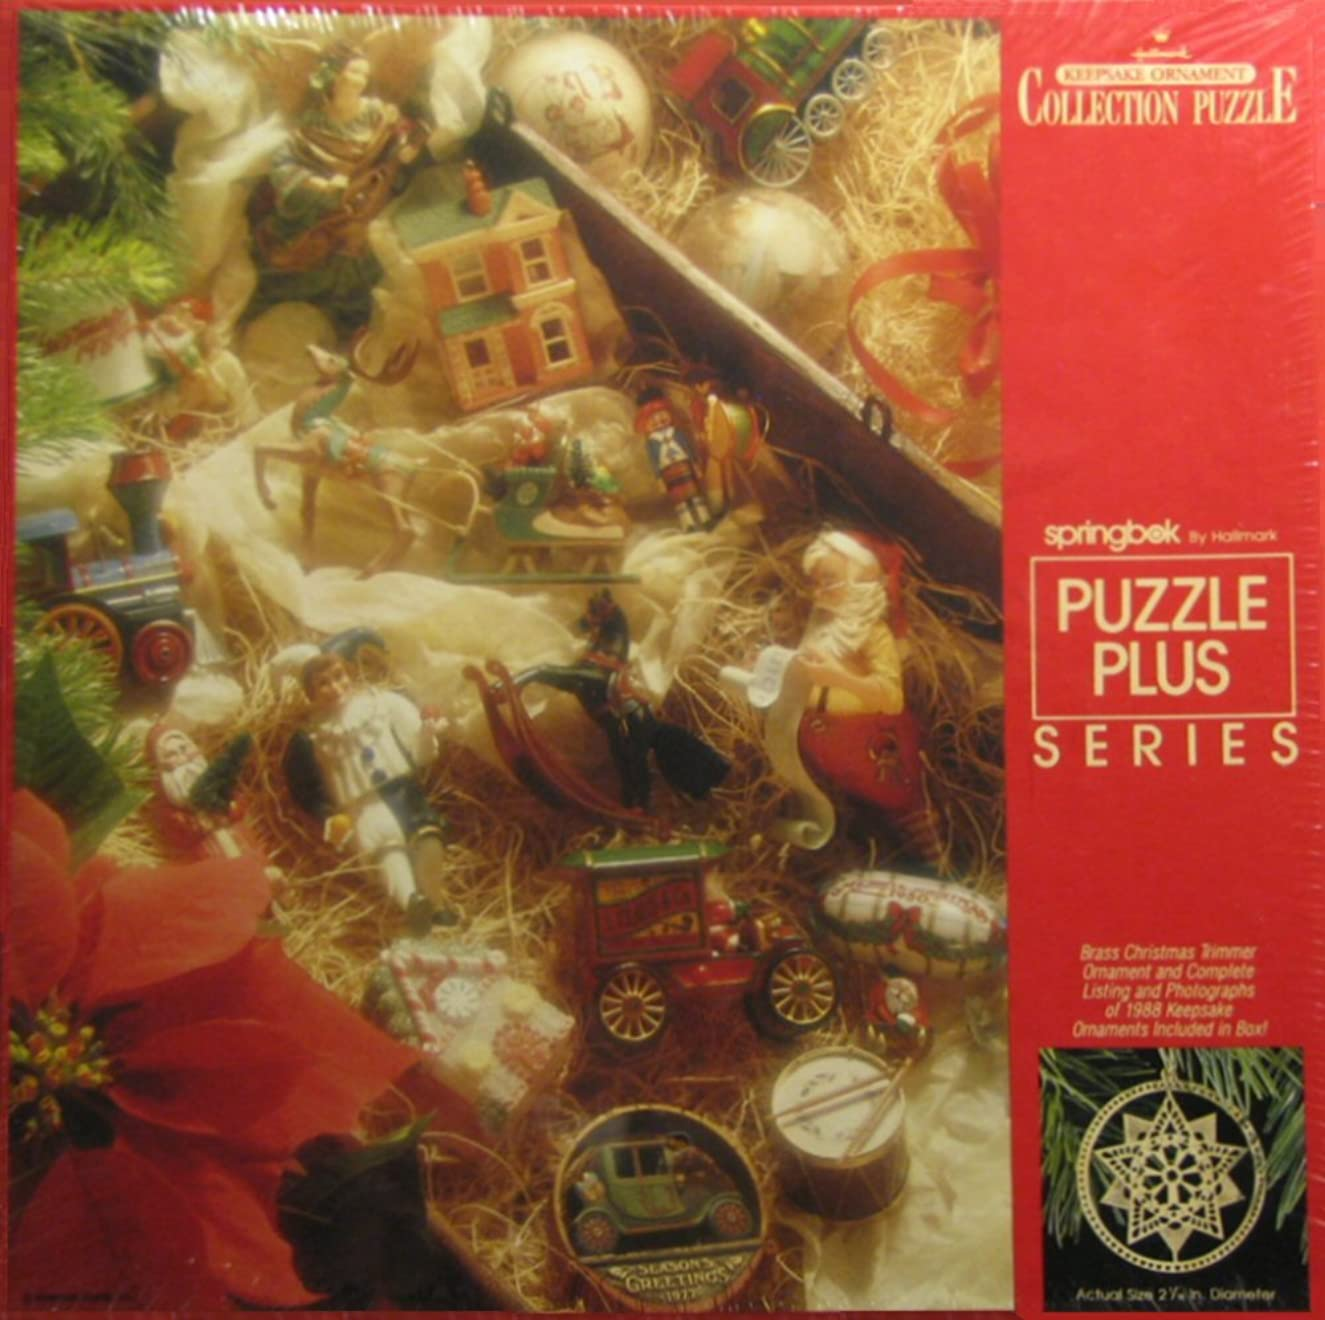 500 Piece Hallmark Keepsale Ornament Collection Puzzle by Sprinkbok